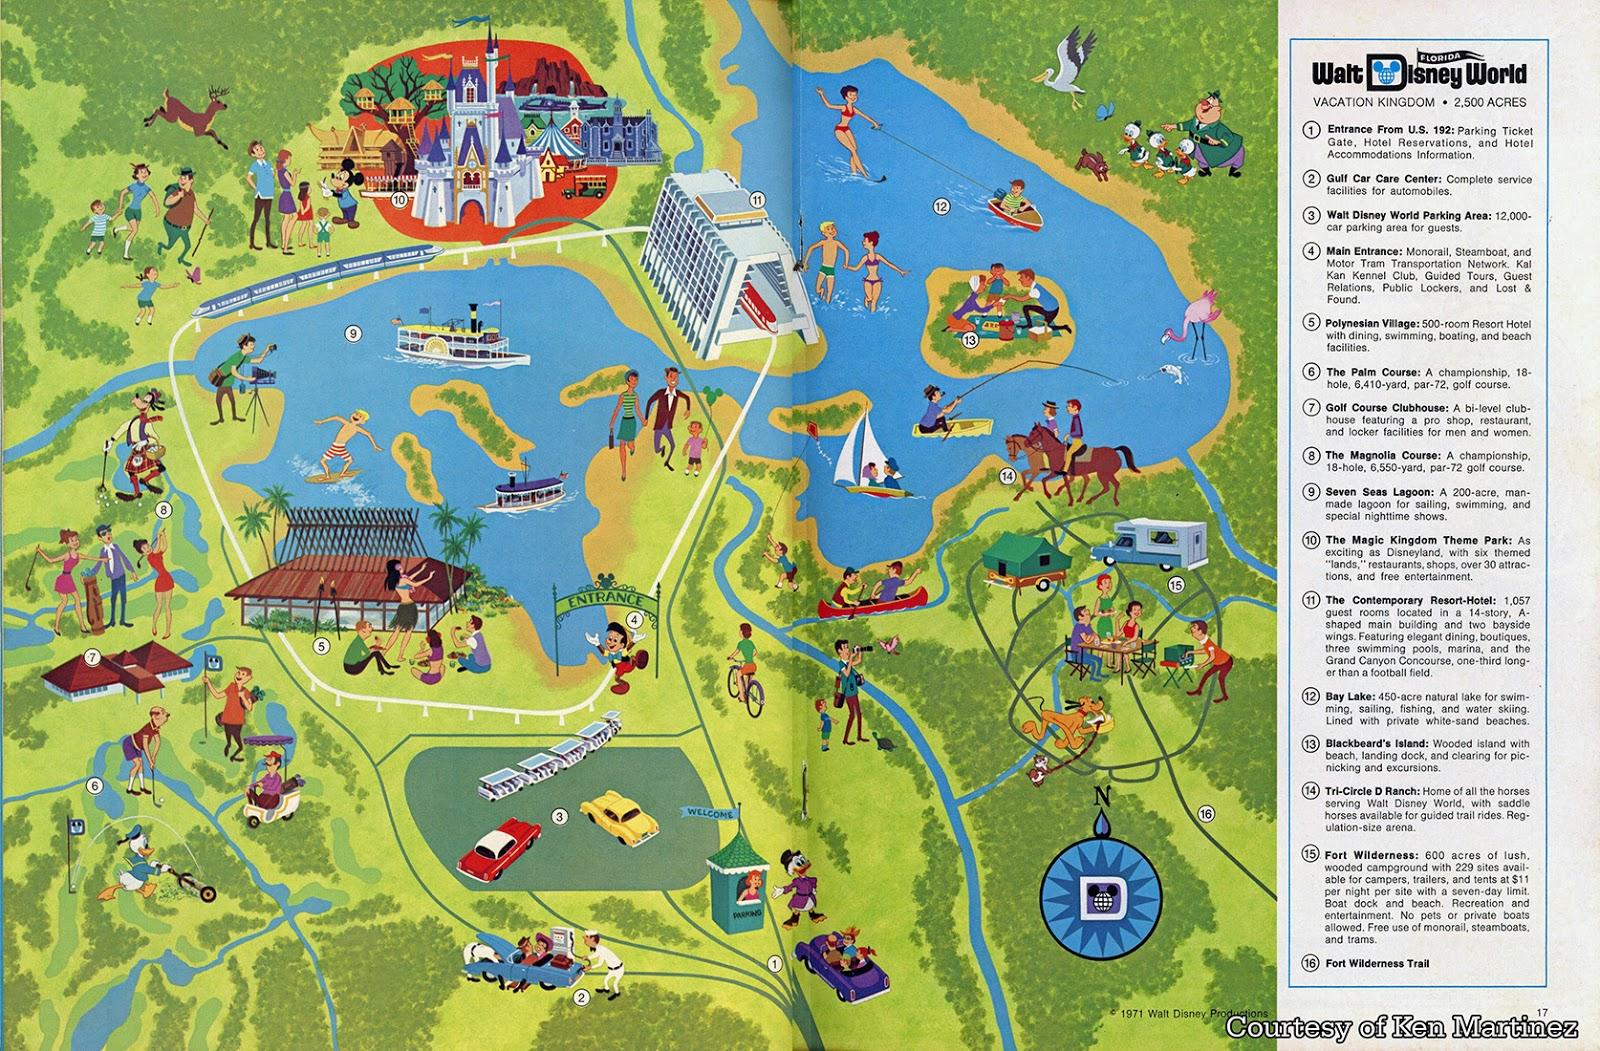 GORILLAS DON'T BLOG: Walt Disney World